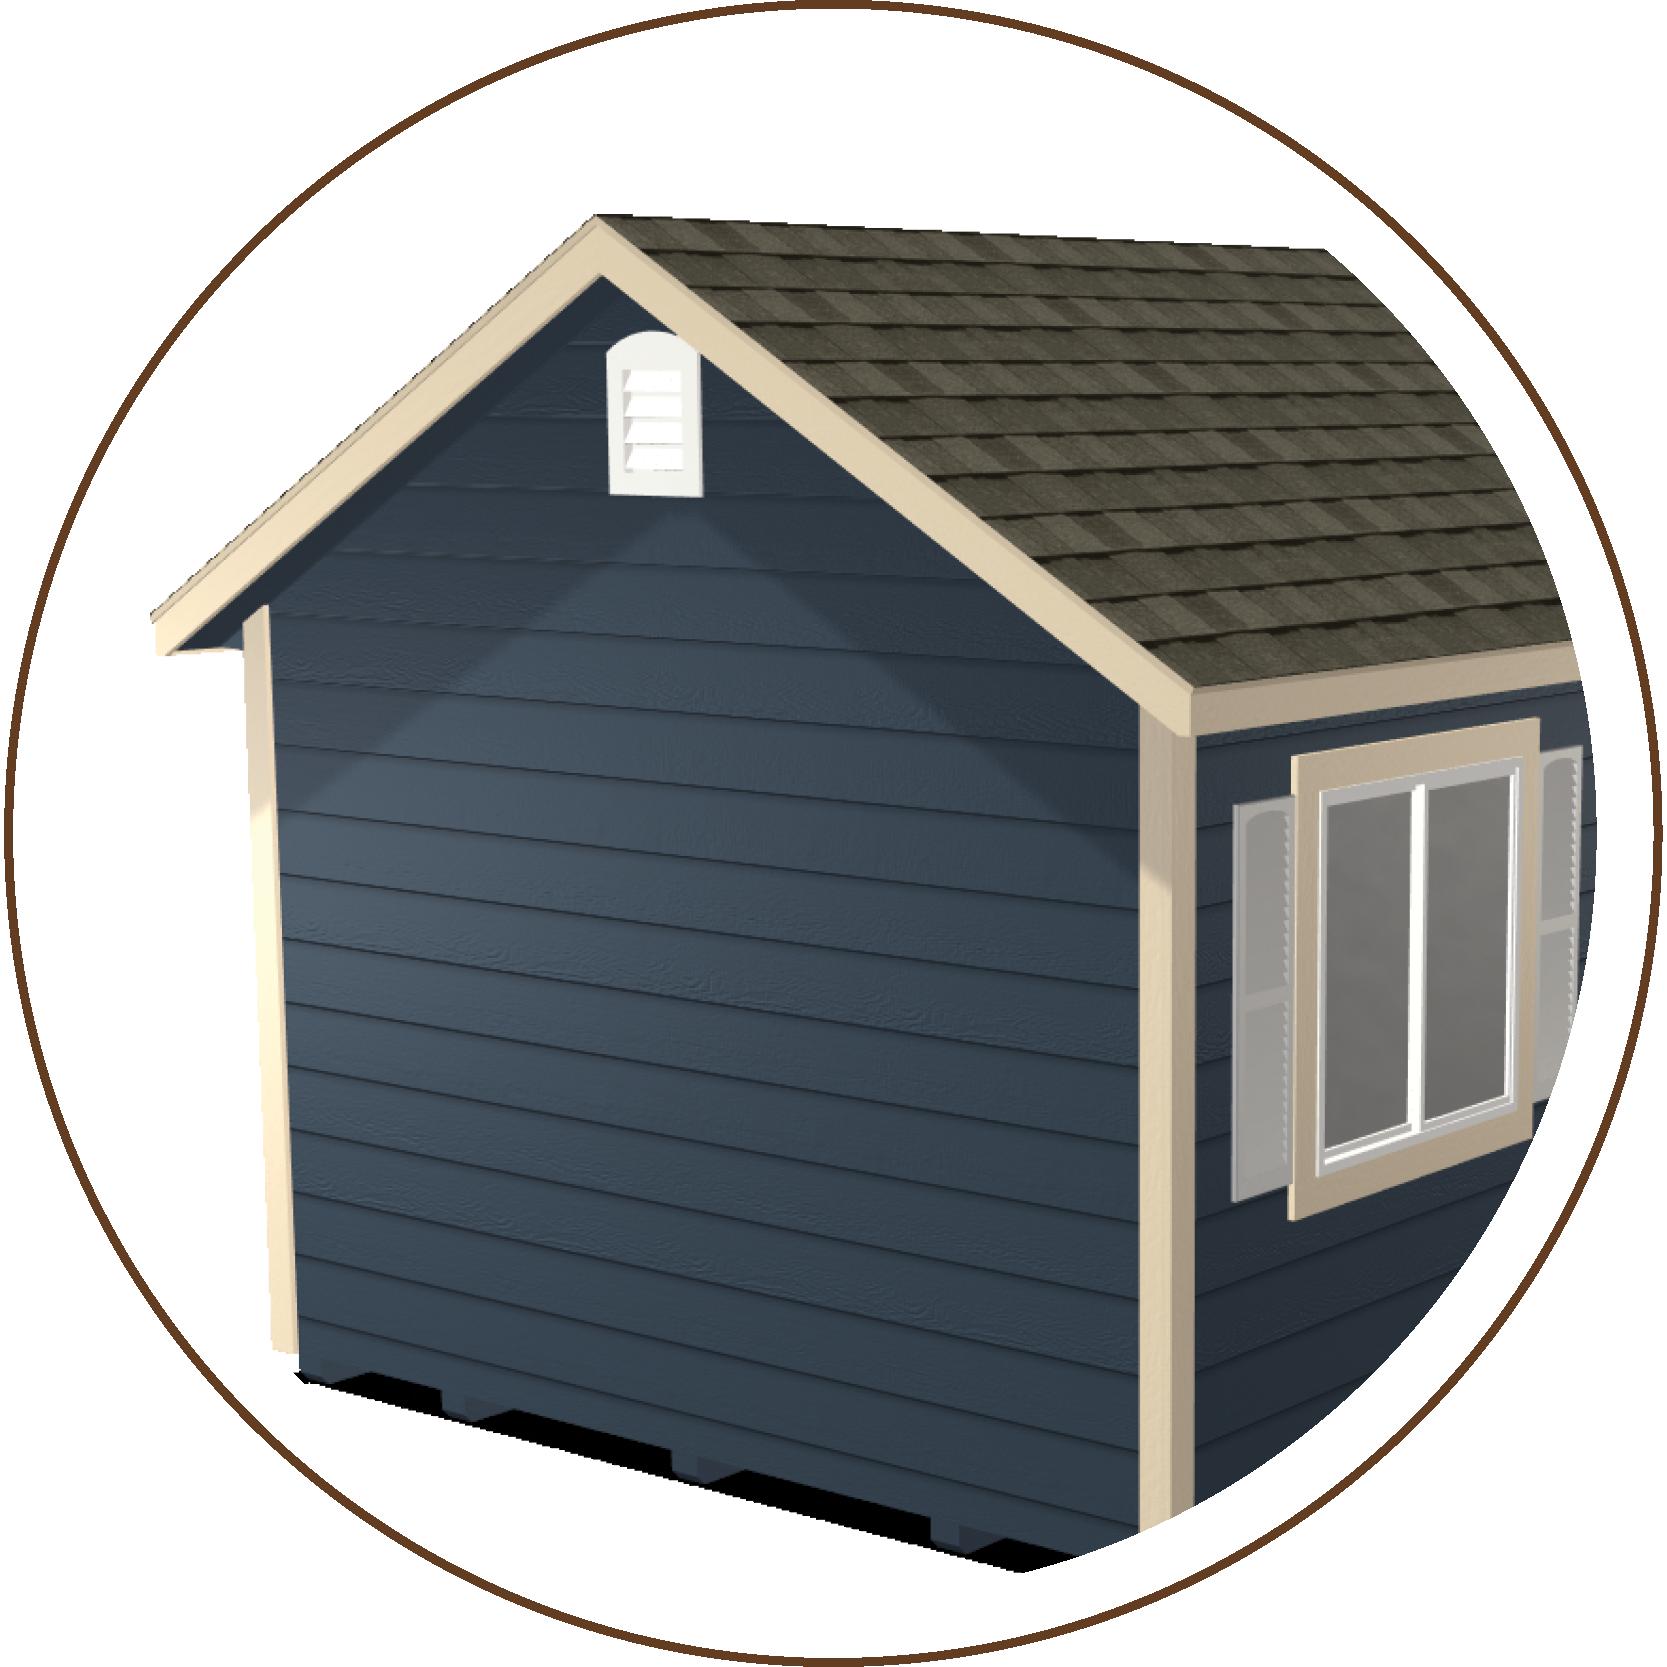 Classic Gable, Ranch Gable, or Quaker Gable Roofline